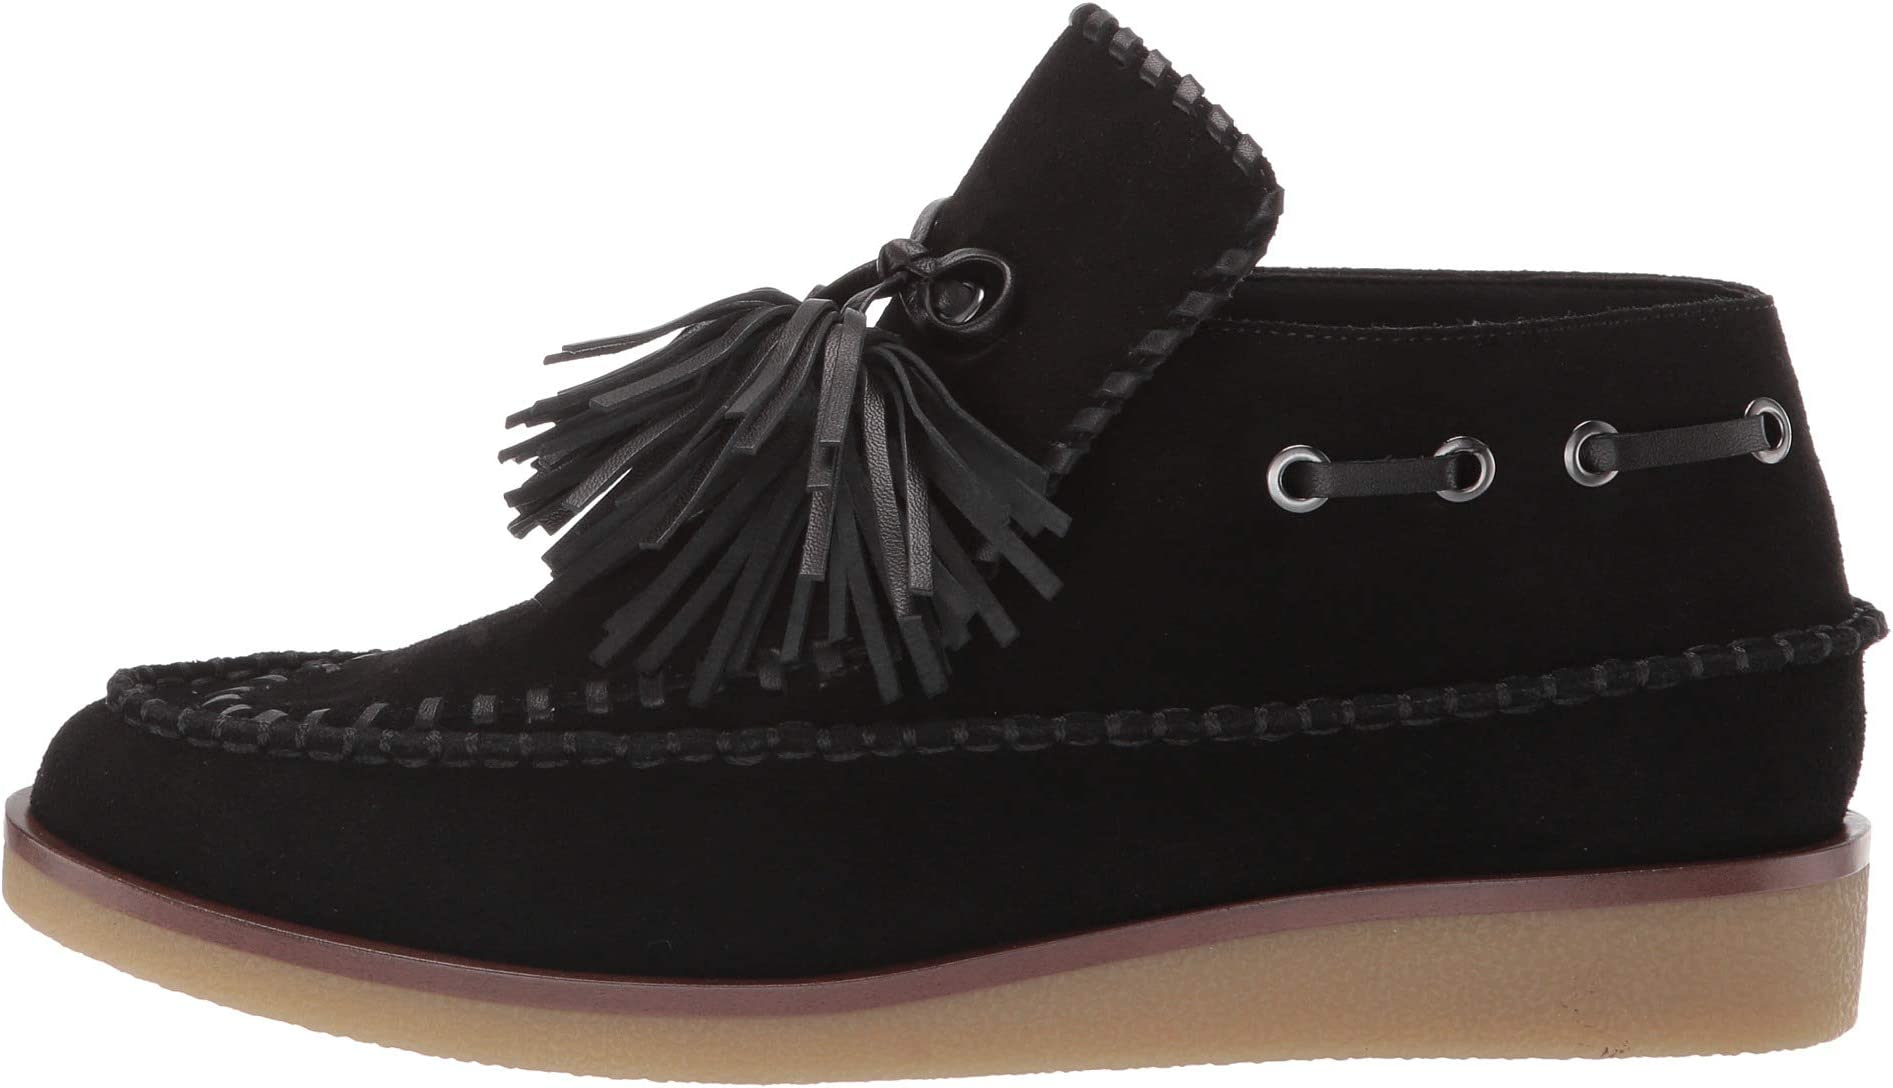 Aerosoles Martha Stewart Shirley | Women's shoes | 2020 Newest